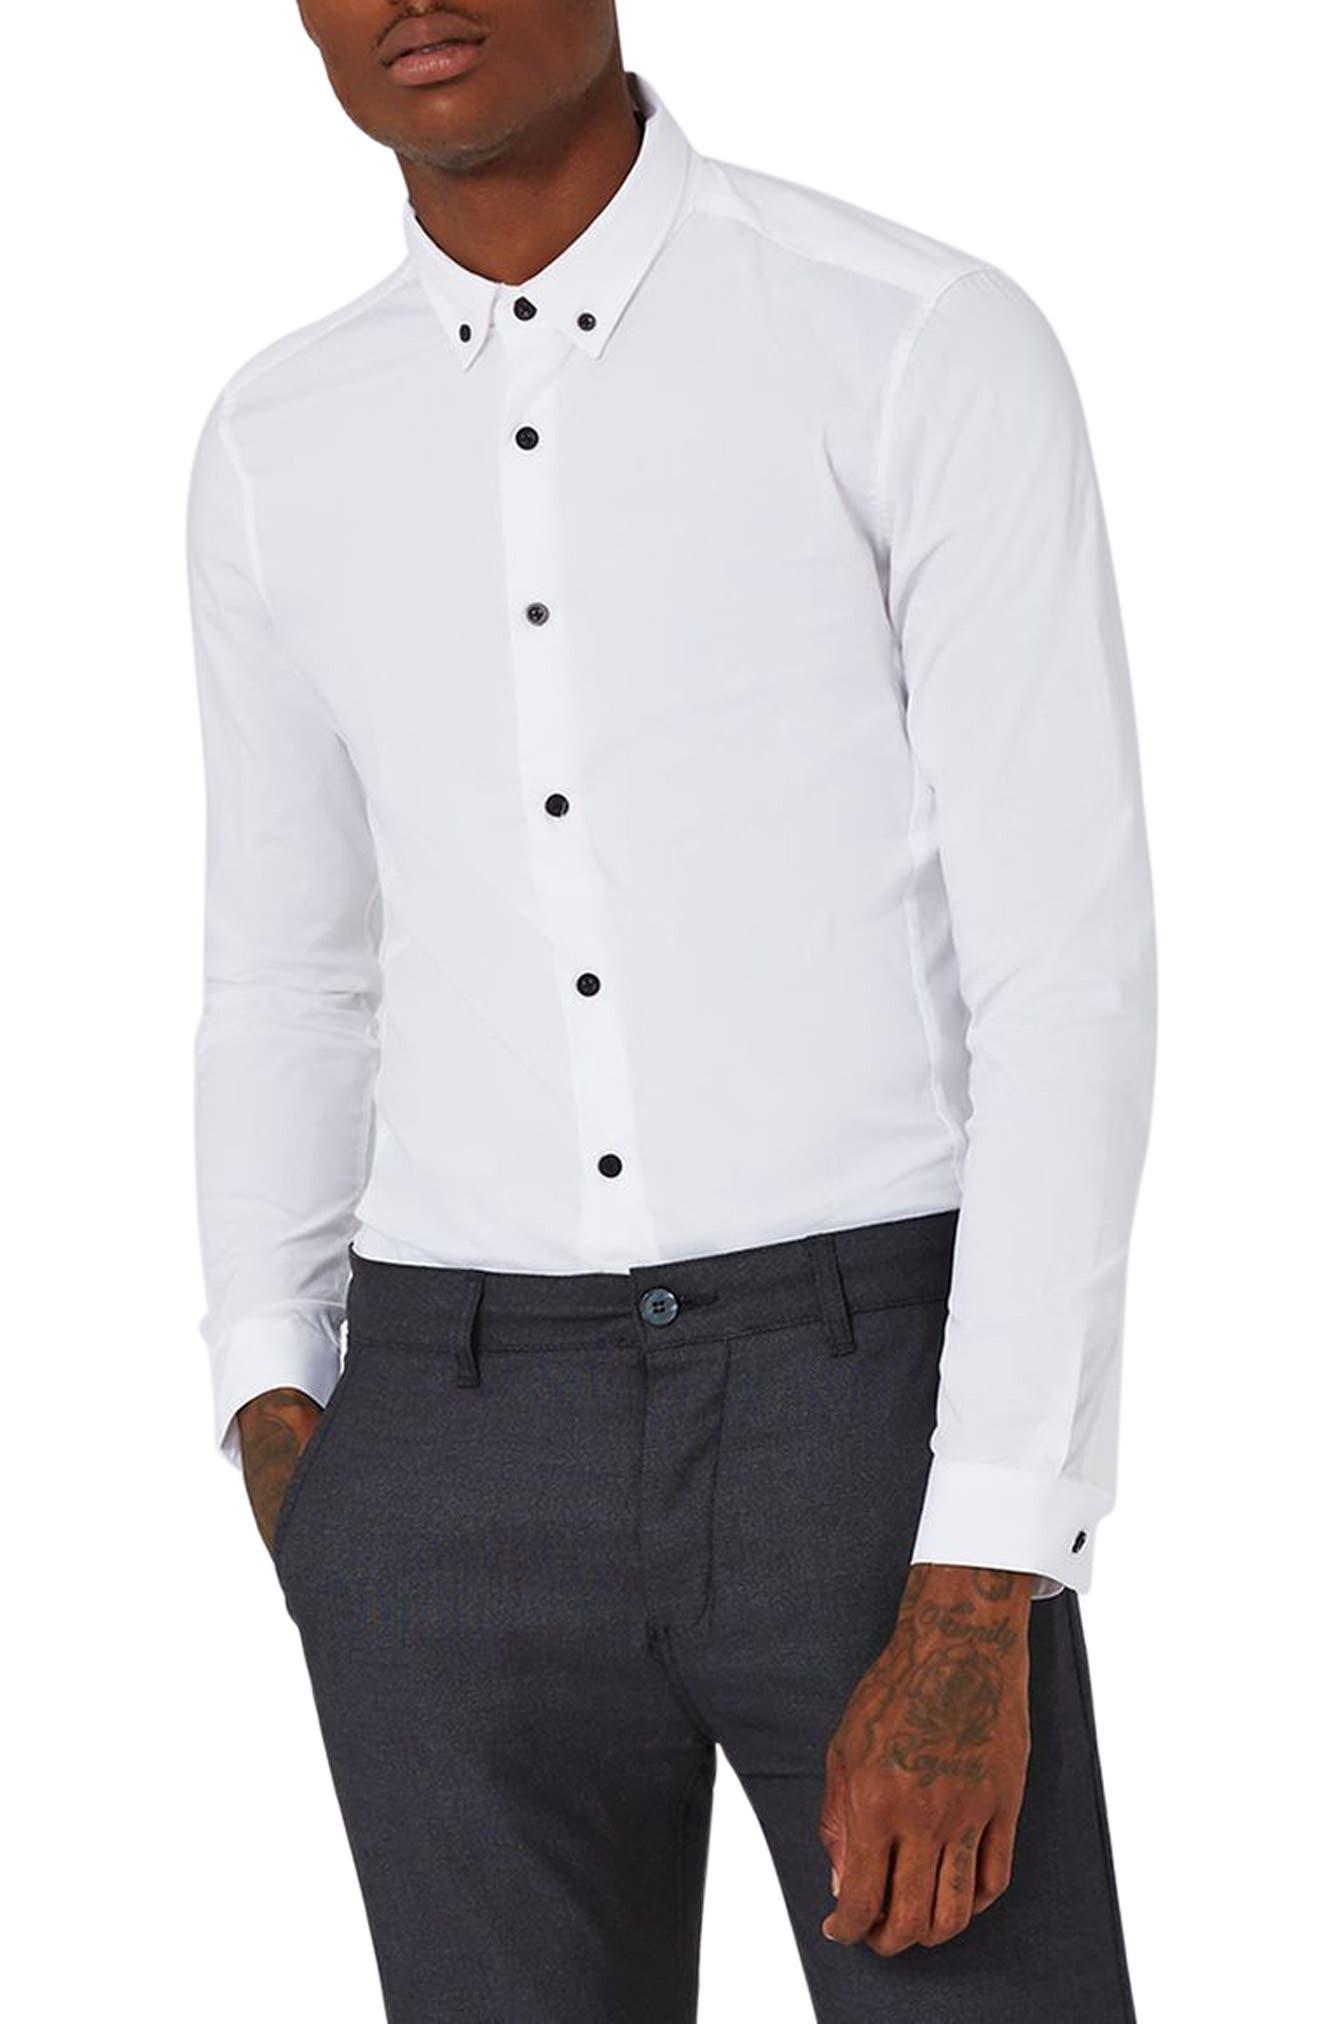 Topman Muscle Fit Smart Shirt